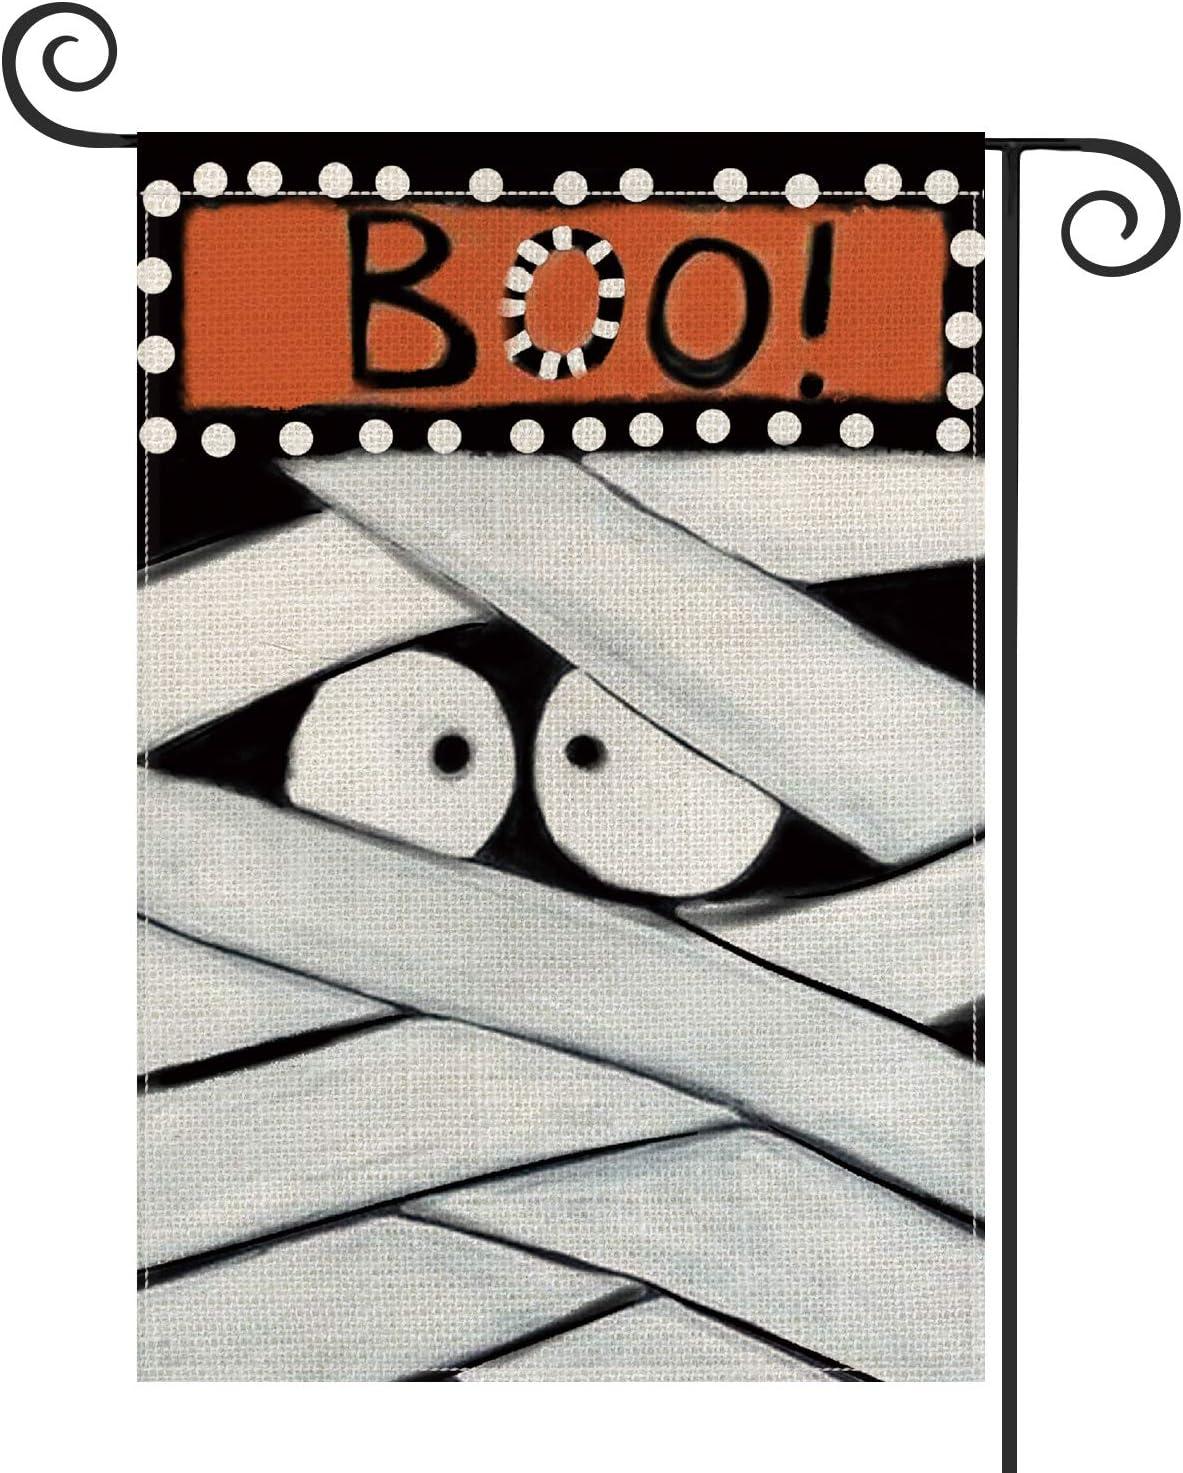 AVOIN Halloween Boo Garden Flag Vertical Double Sized, Cartoon Mummy Day of The Dead Yard Outdoor Decoration 12.5 x 18 Inch